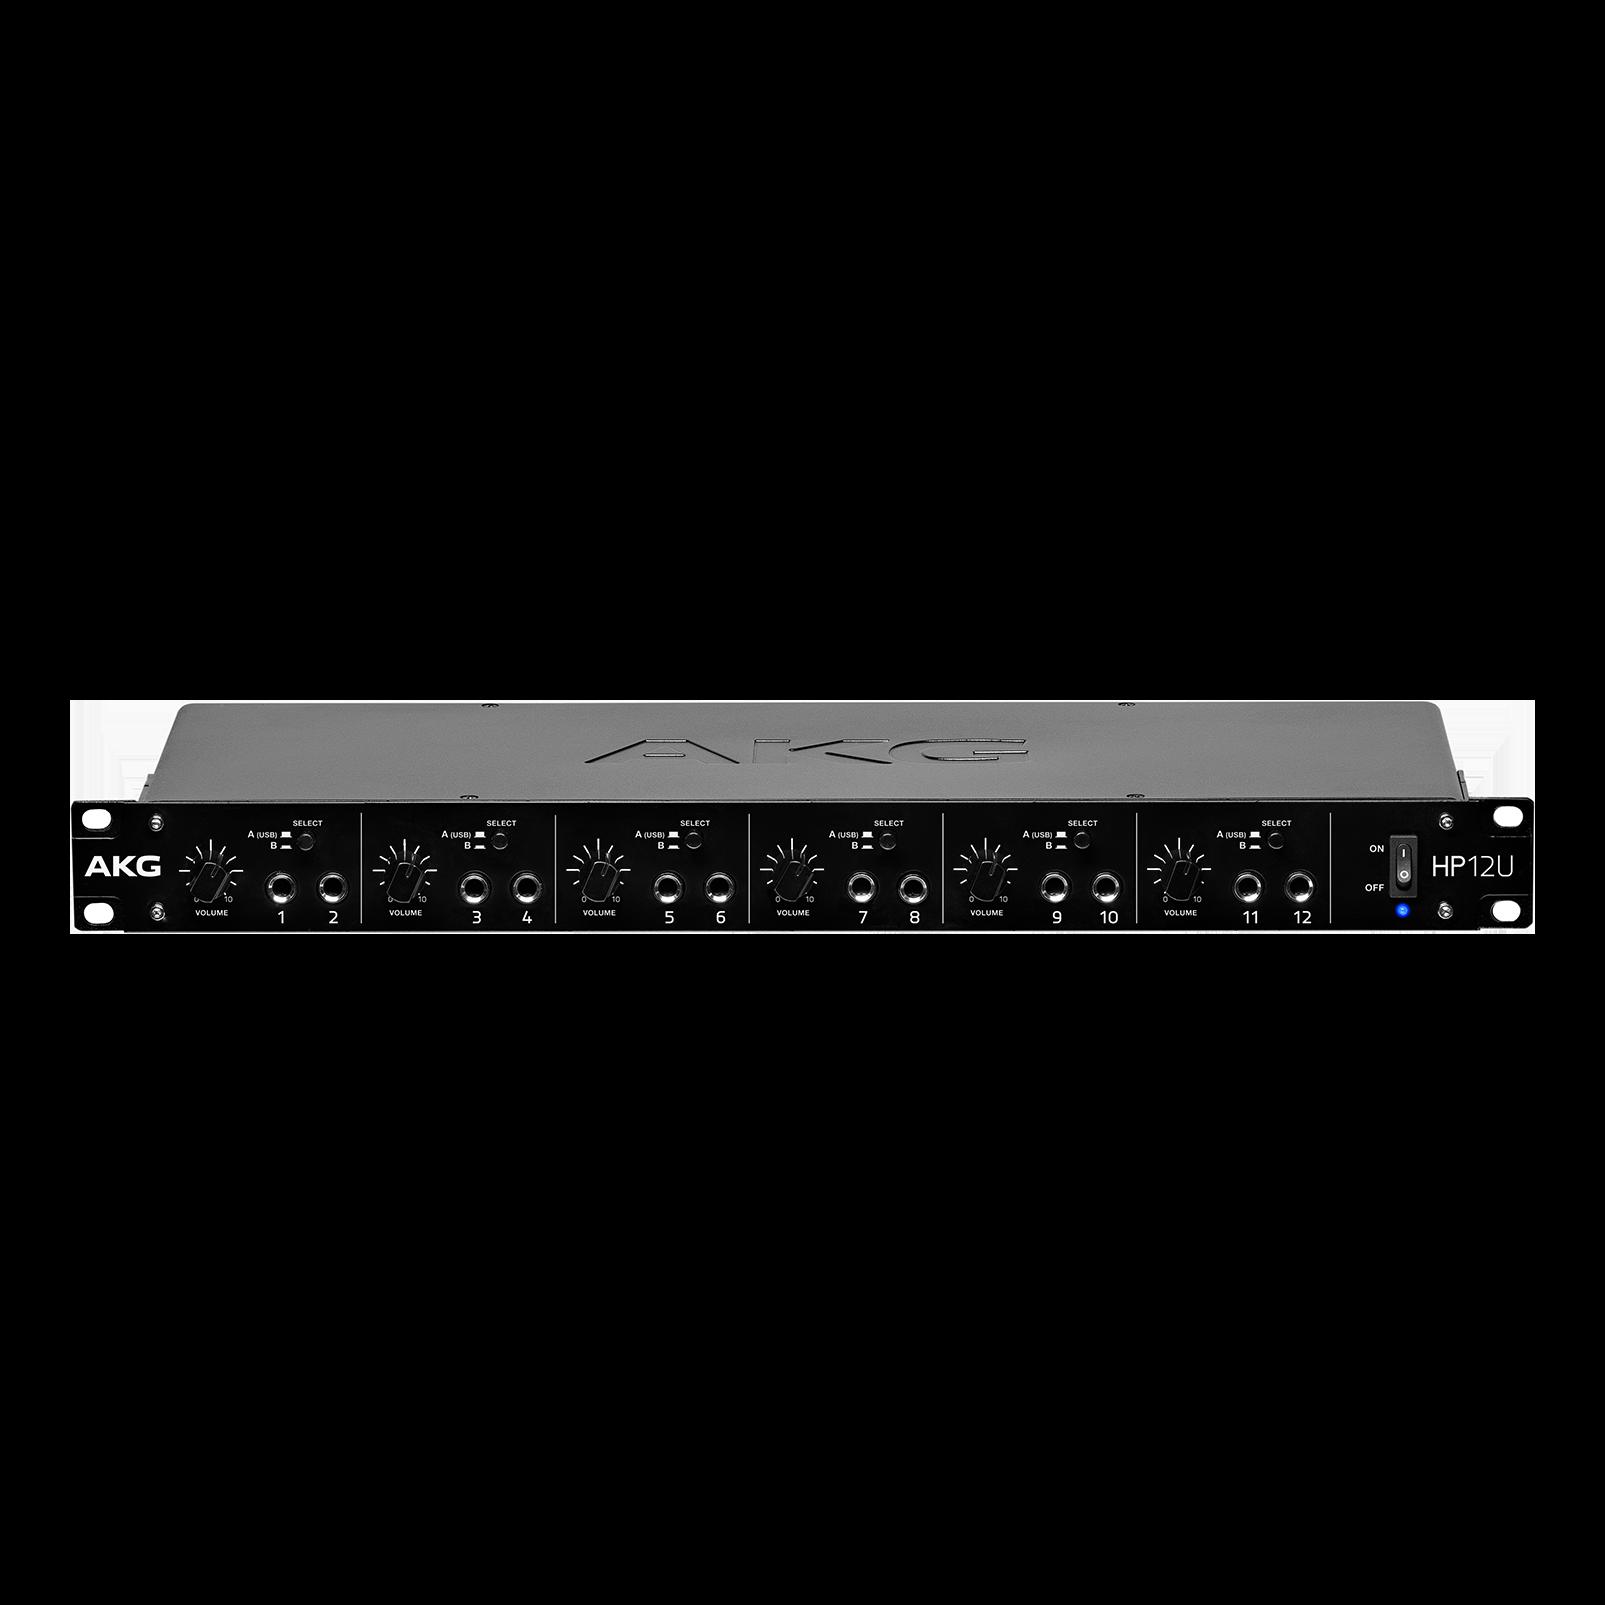 HP12U - Black - 12-Channel Headphone Amplifier with USB - Hero